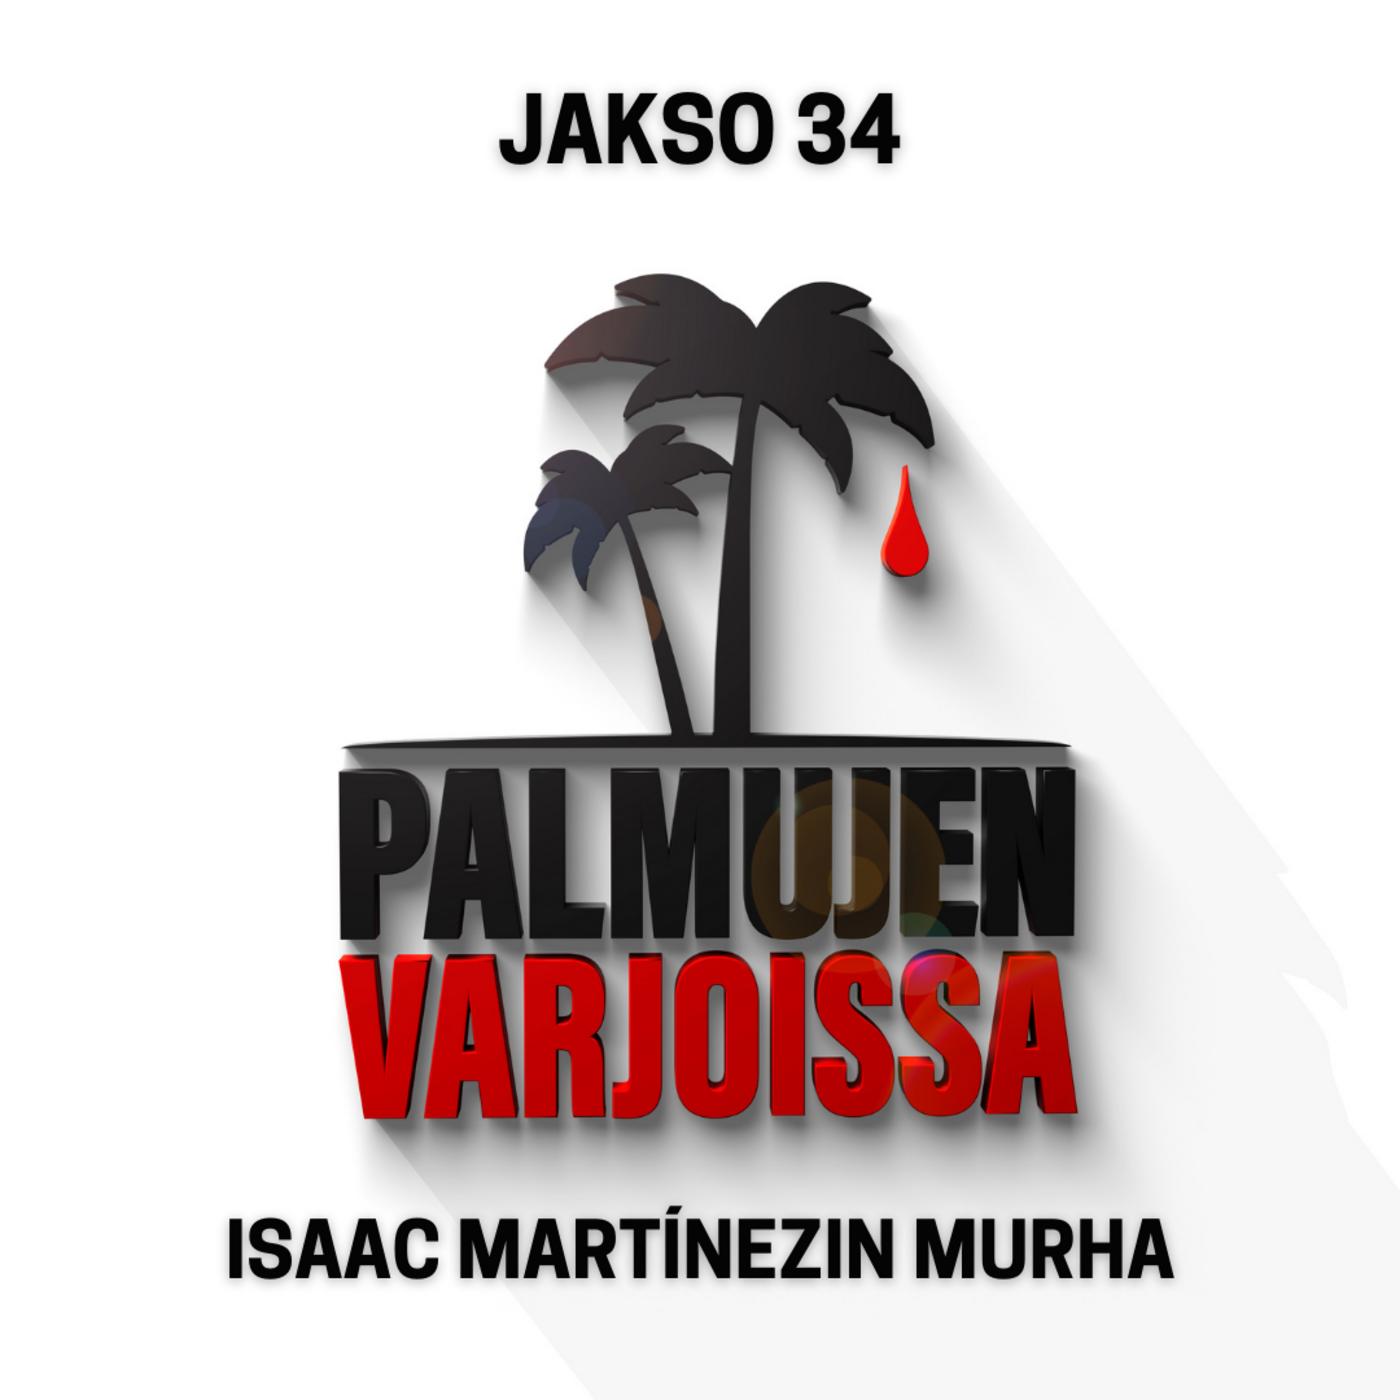 34: Isaac Martinezin murha